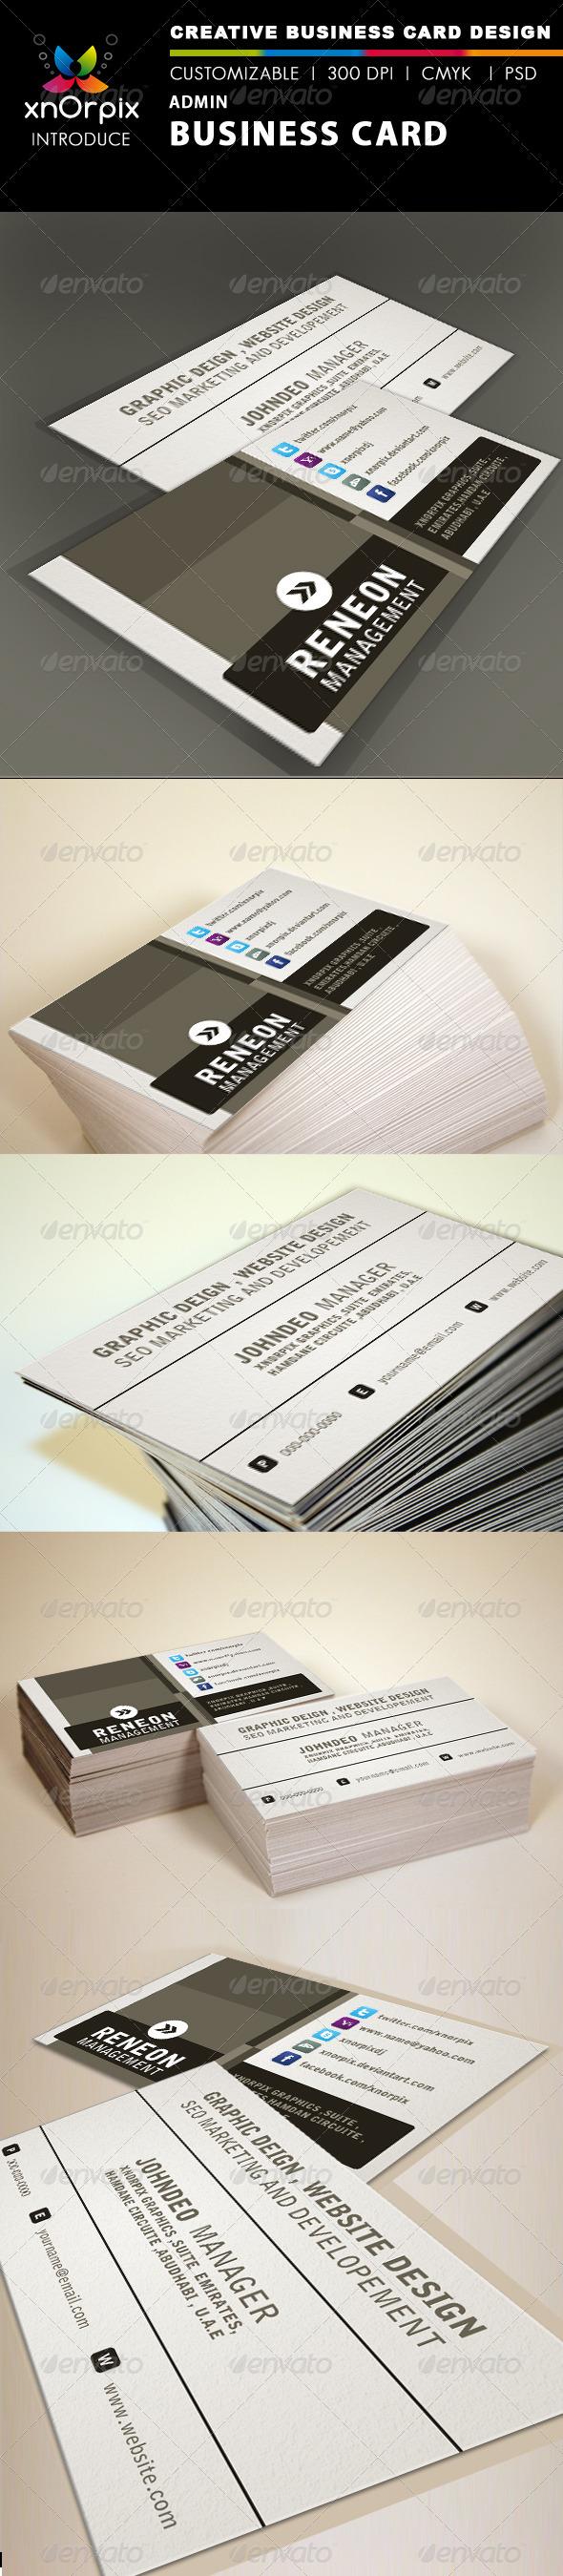 GraphicRiver Admin Business Card 1687067